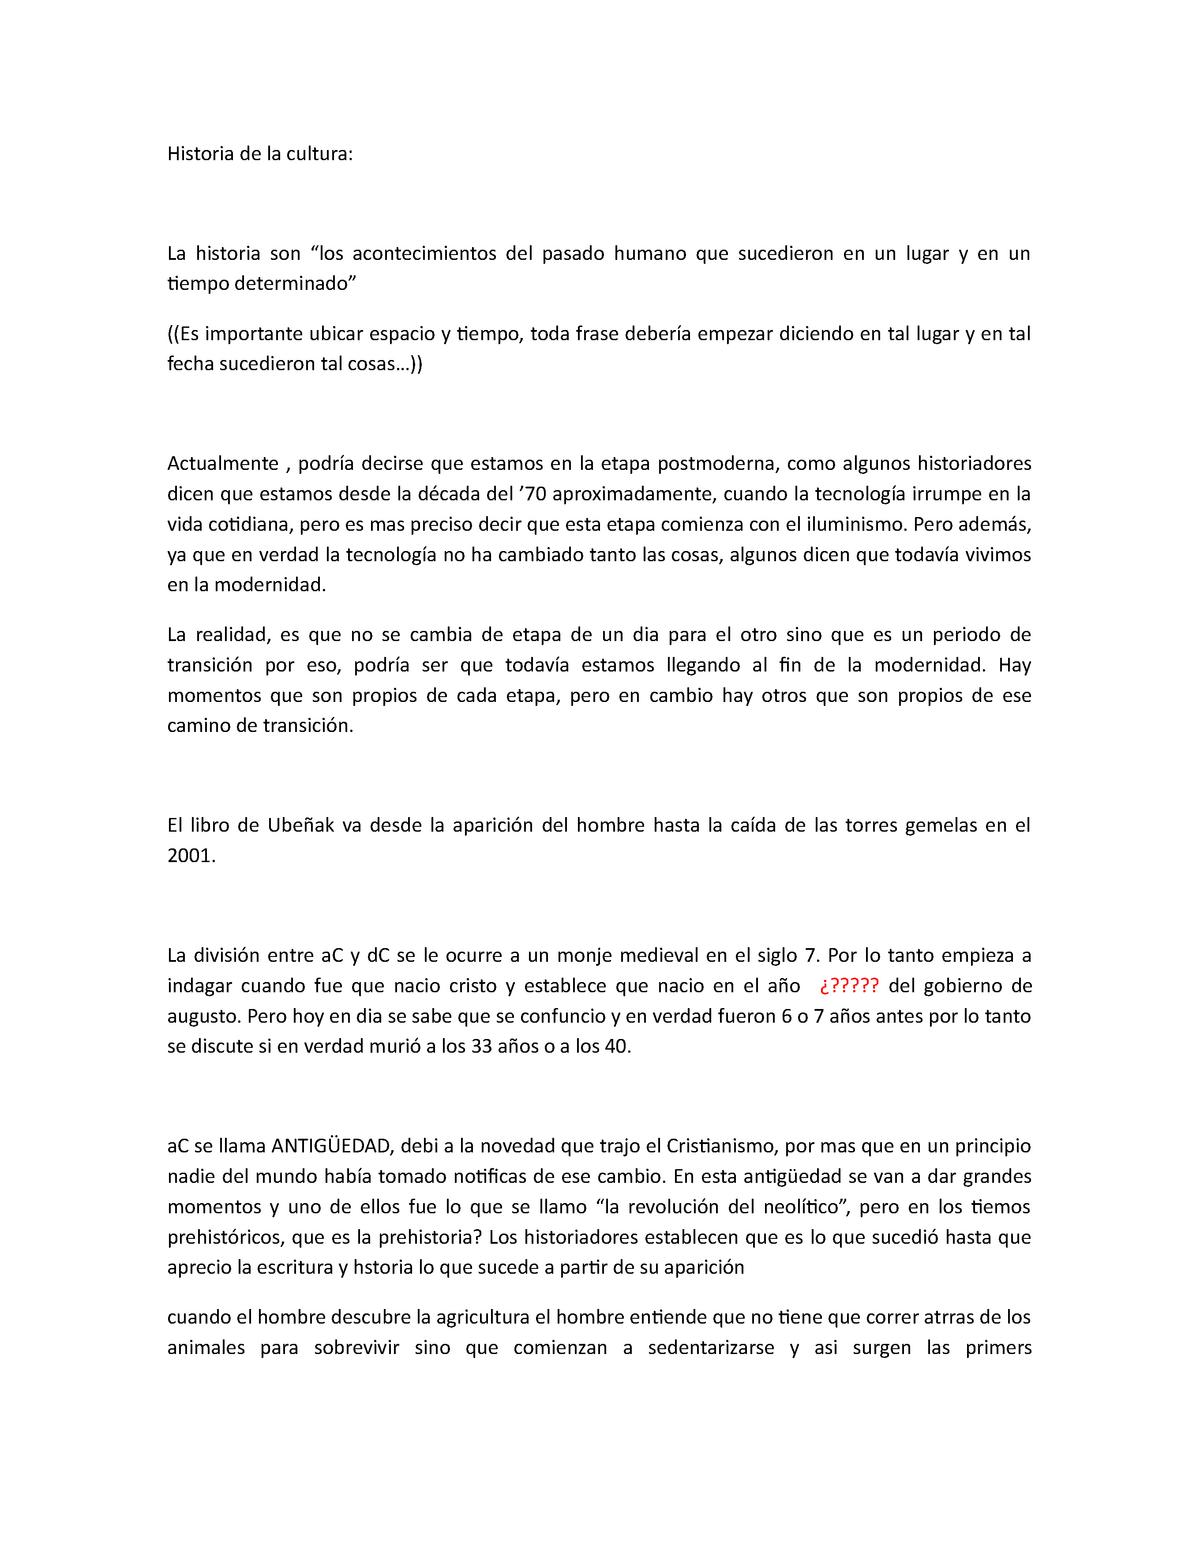 Historia De La Cultura Resumen Del Libro De Ubeñak Studocu